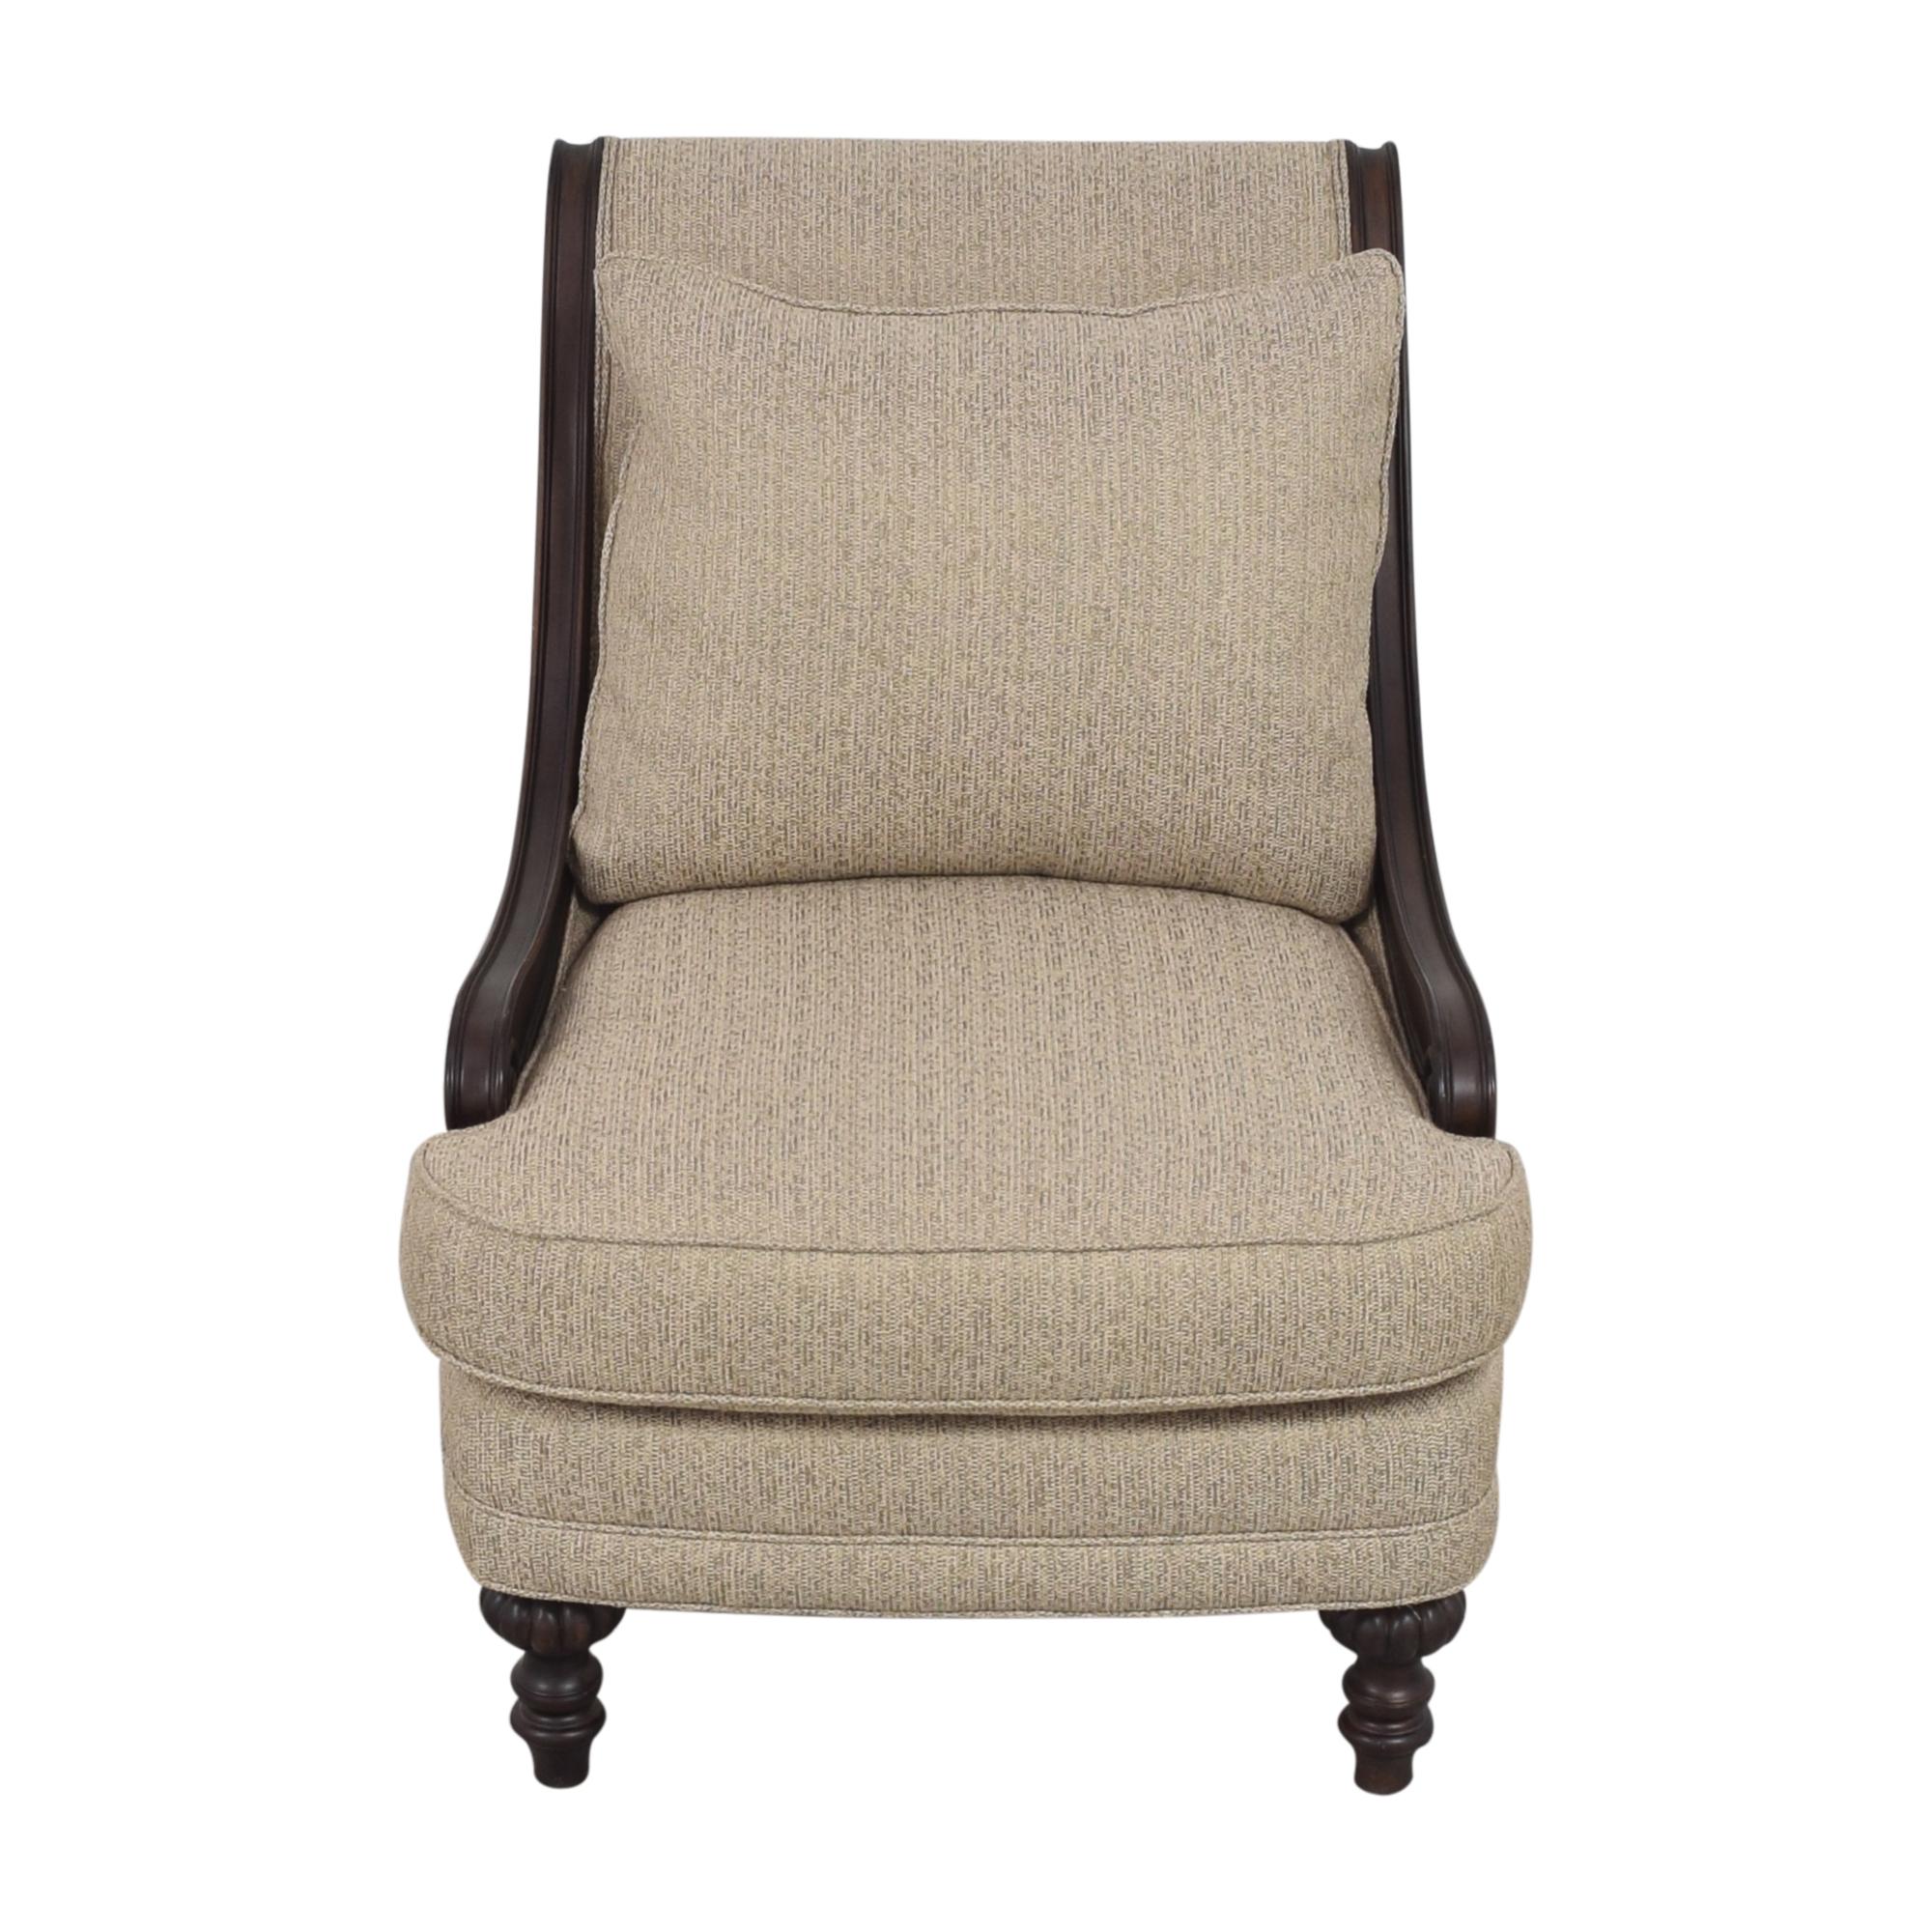 Drexel Heritage Drexel Heritage Basilia Chair dimensions